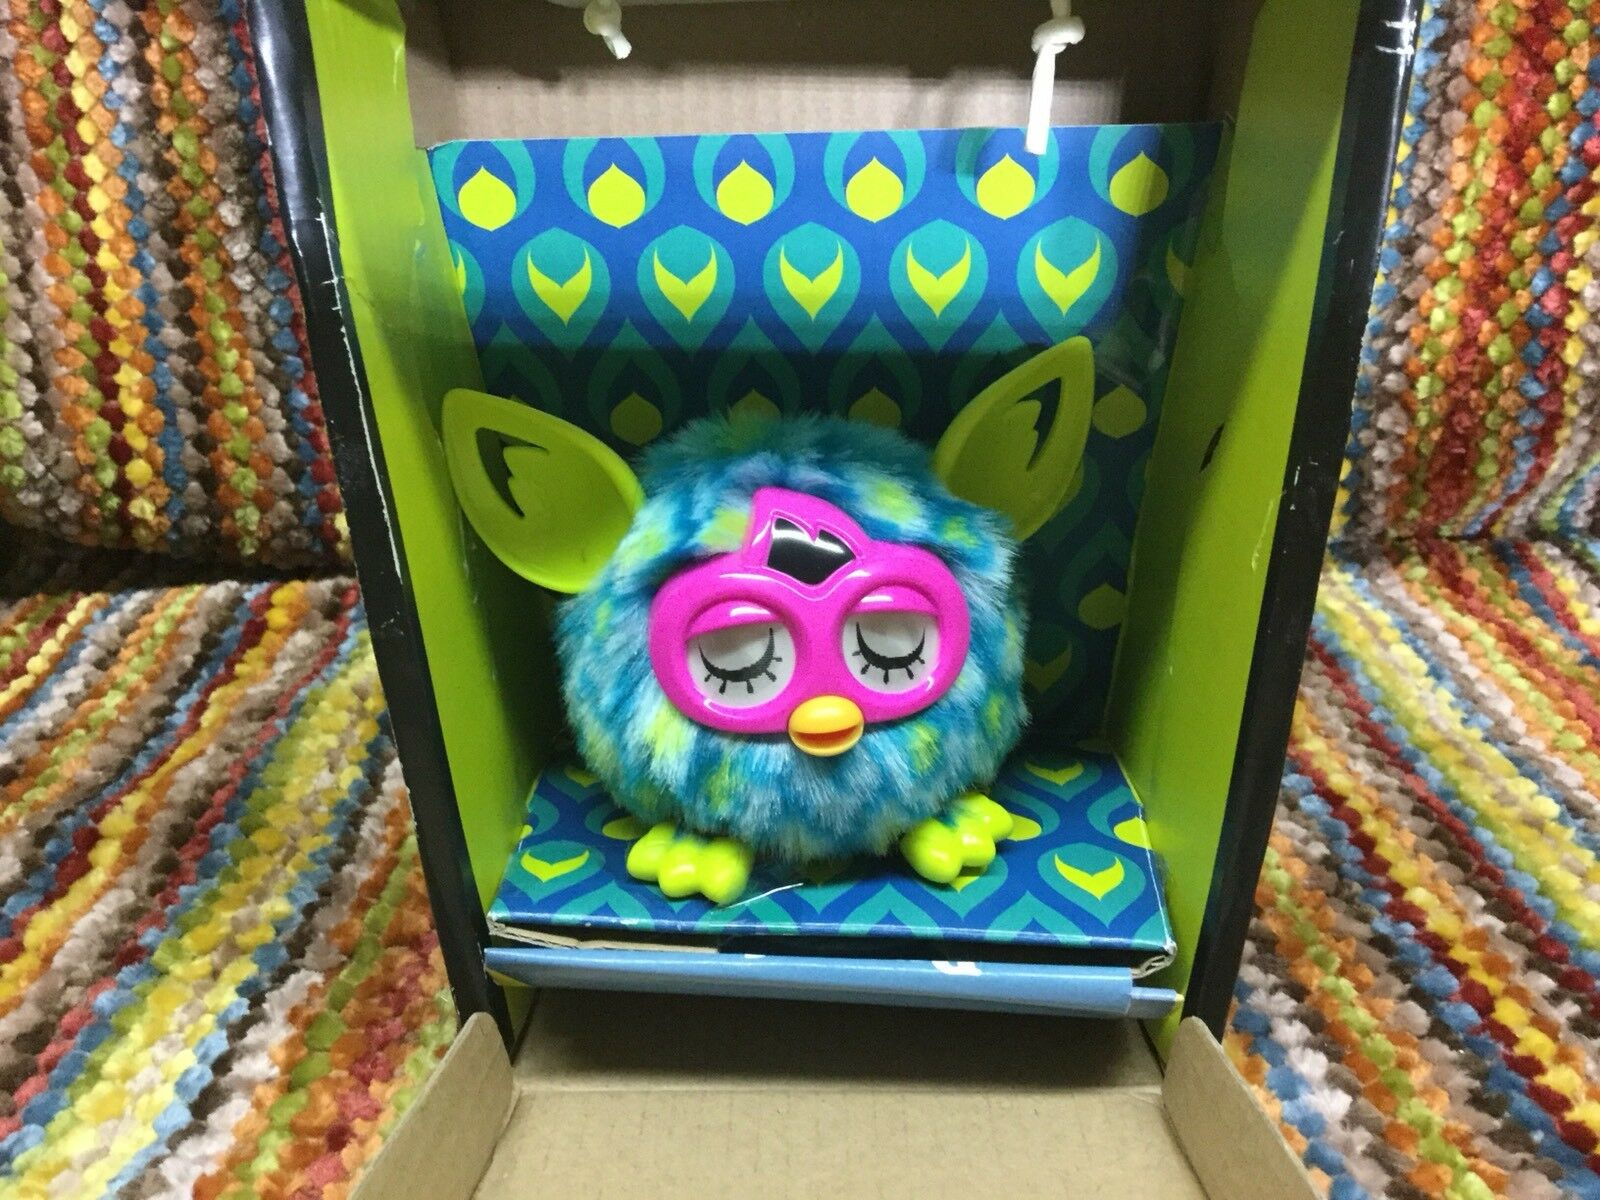 Furby Furblings Teal bluee With Green Dots HASBRO NIB